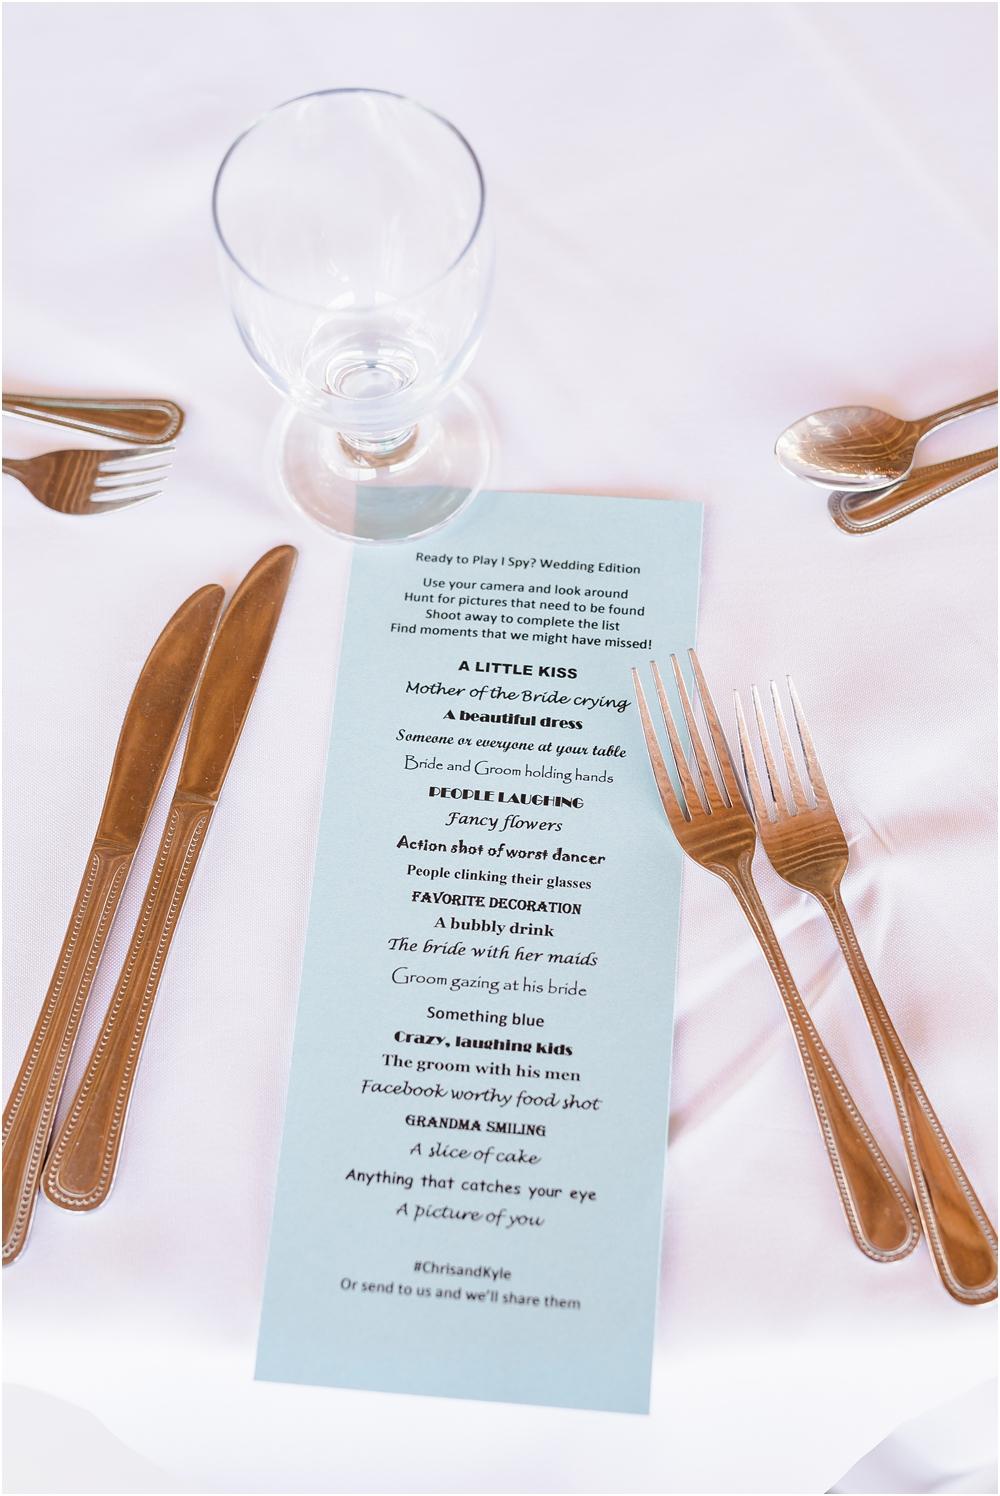 ledman-wedding-kiersten-stevenson-photography-30a-panama-city-beach-dothan-tallahassee-(36-of-763).JPG